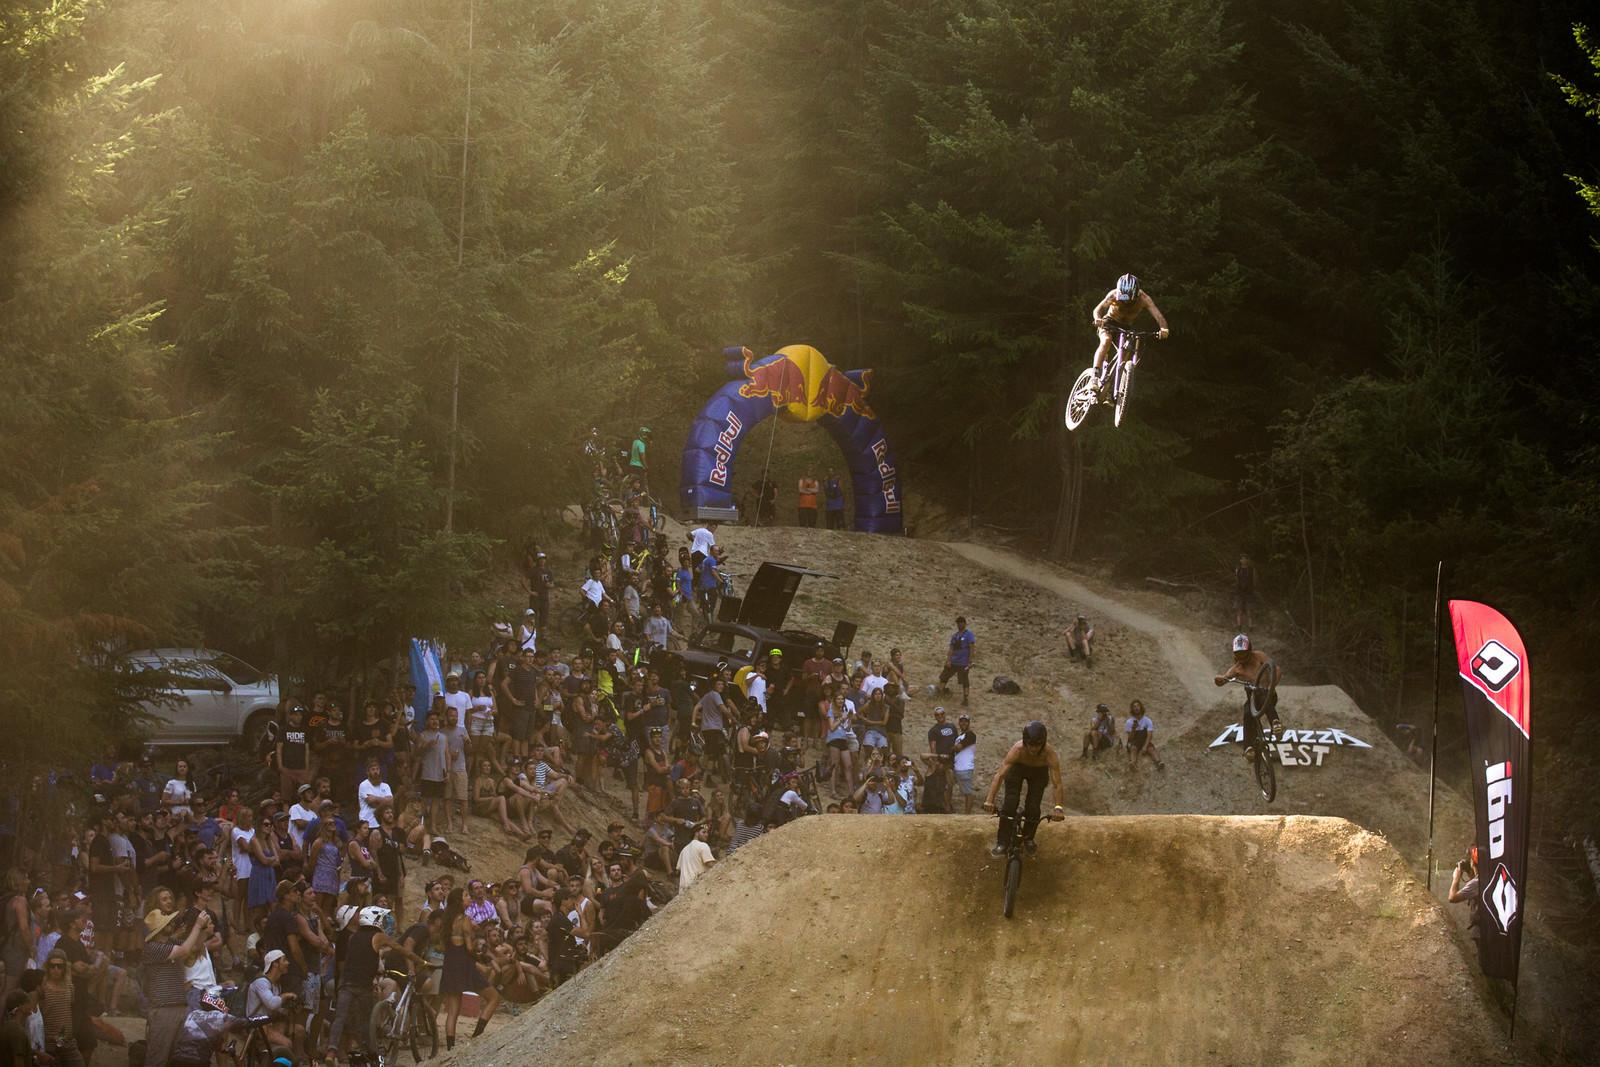 No shirt, no problem - McGazza Fest Dream Track Jam - Mountain Biking Pictures - Vital MTB